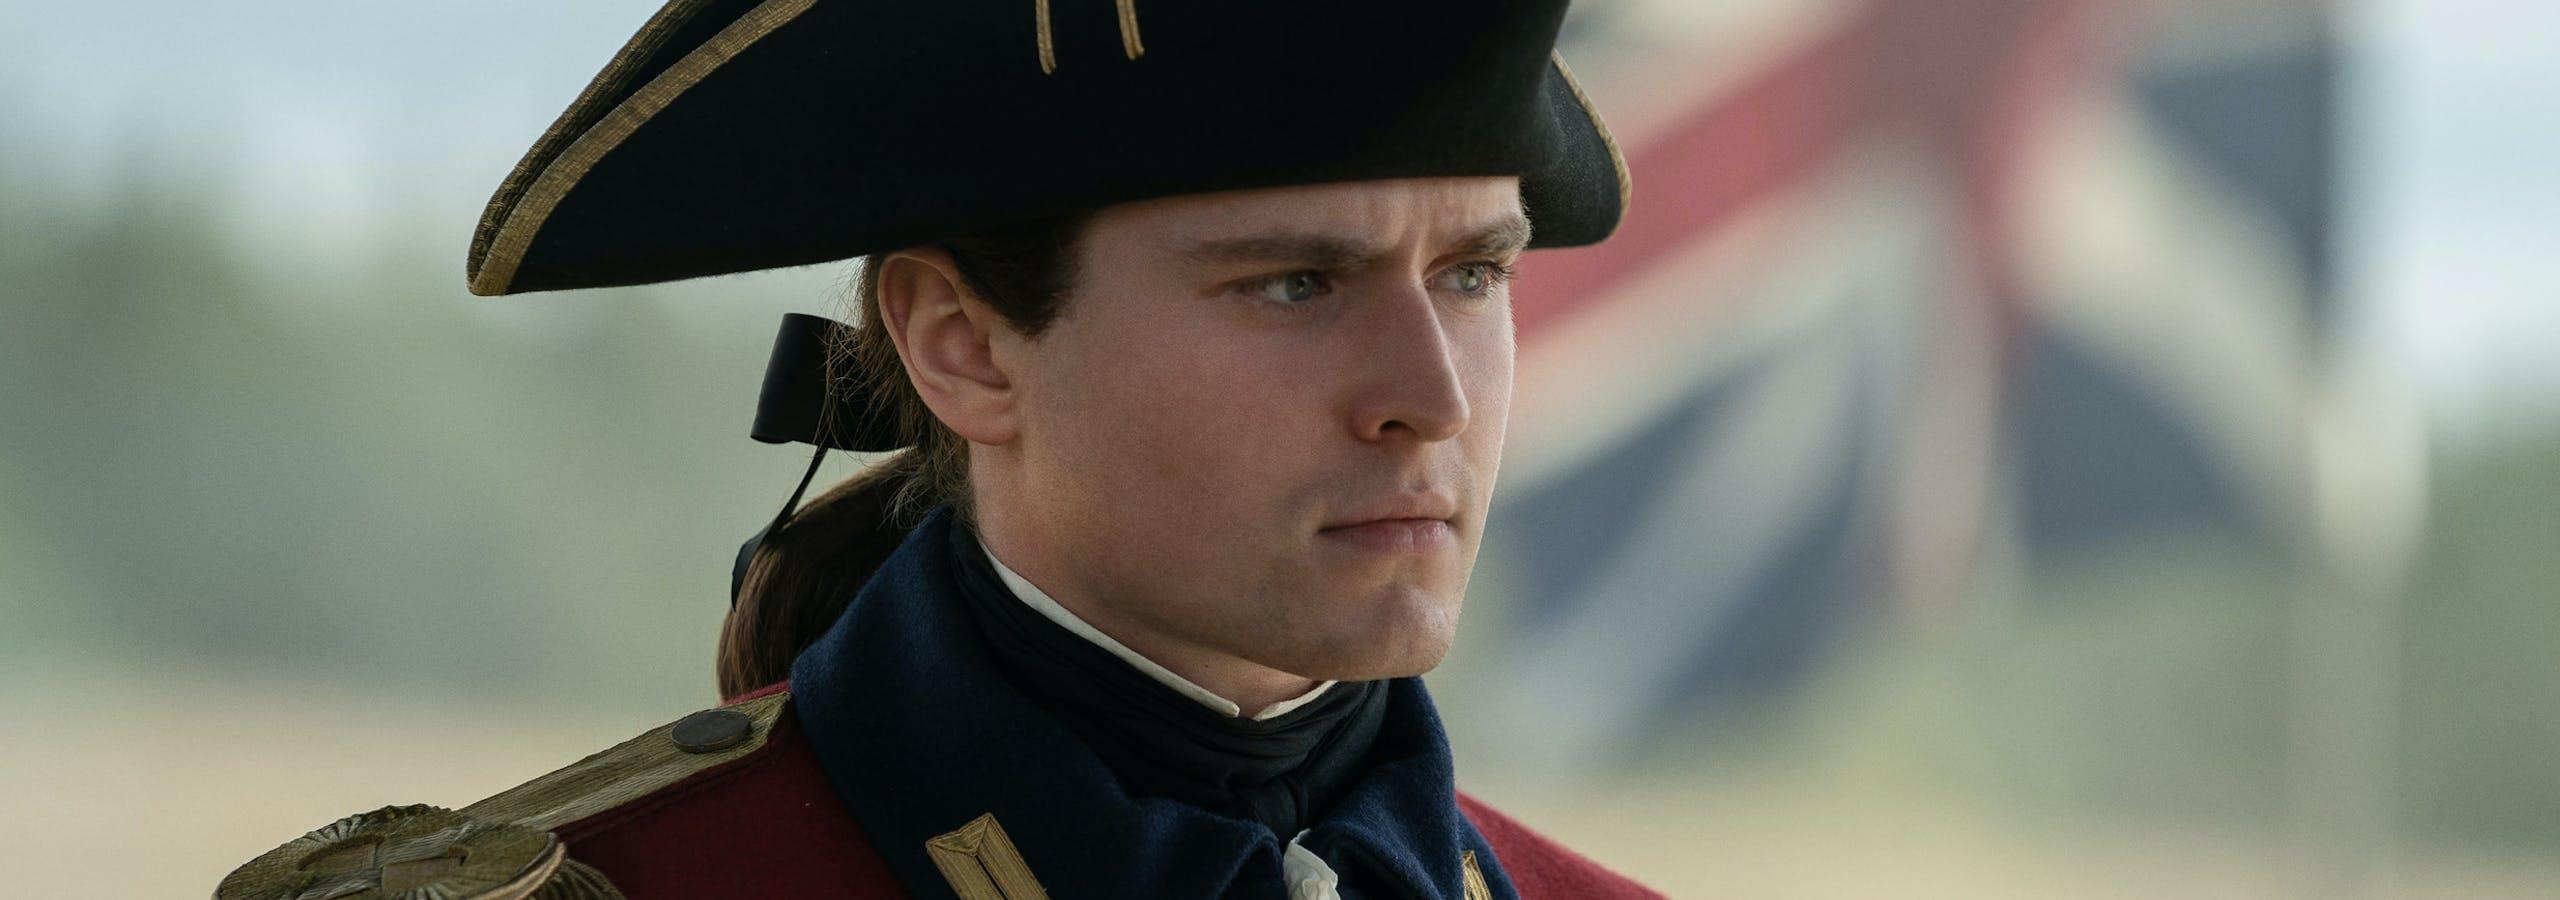 Outlander Official Site | STARZ